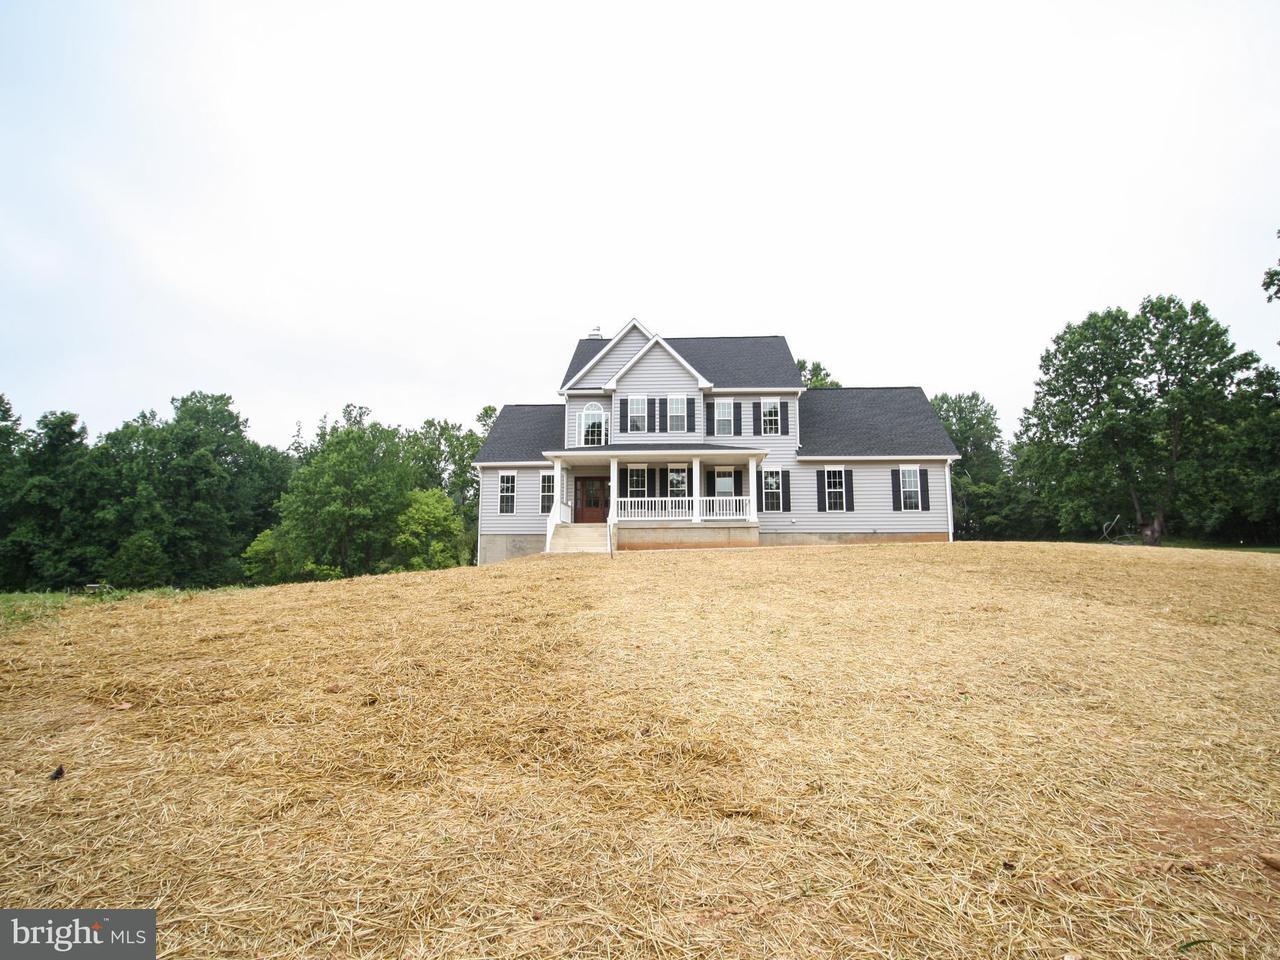 Single Family Home for Sale at Jonas Road Jonas Road Culpeper, Virginia 22701 United States